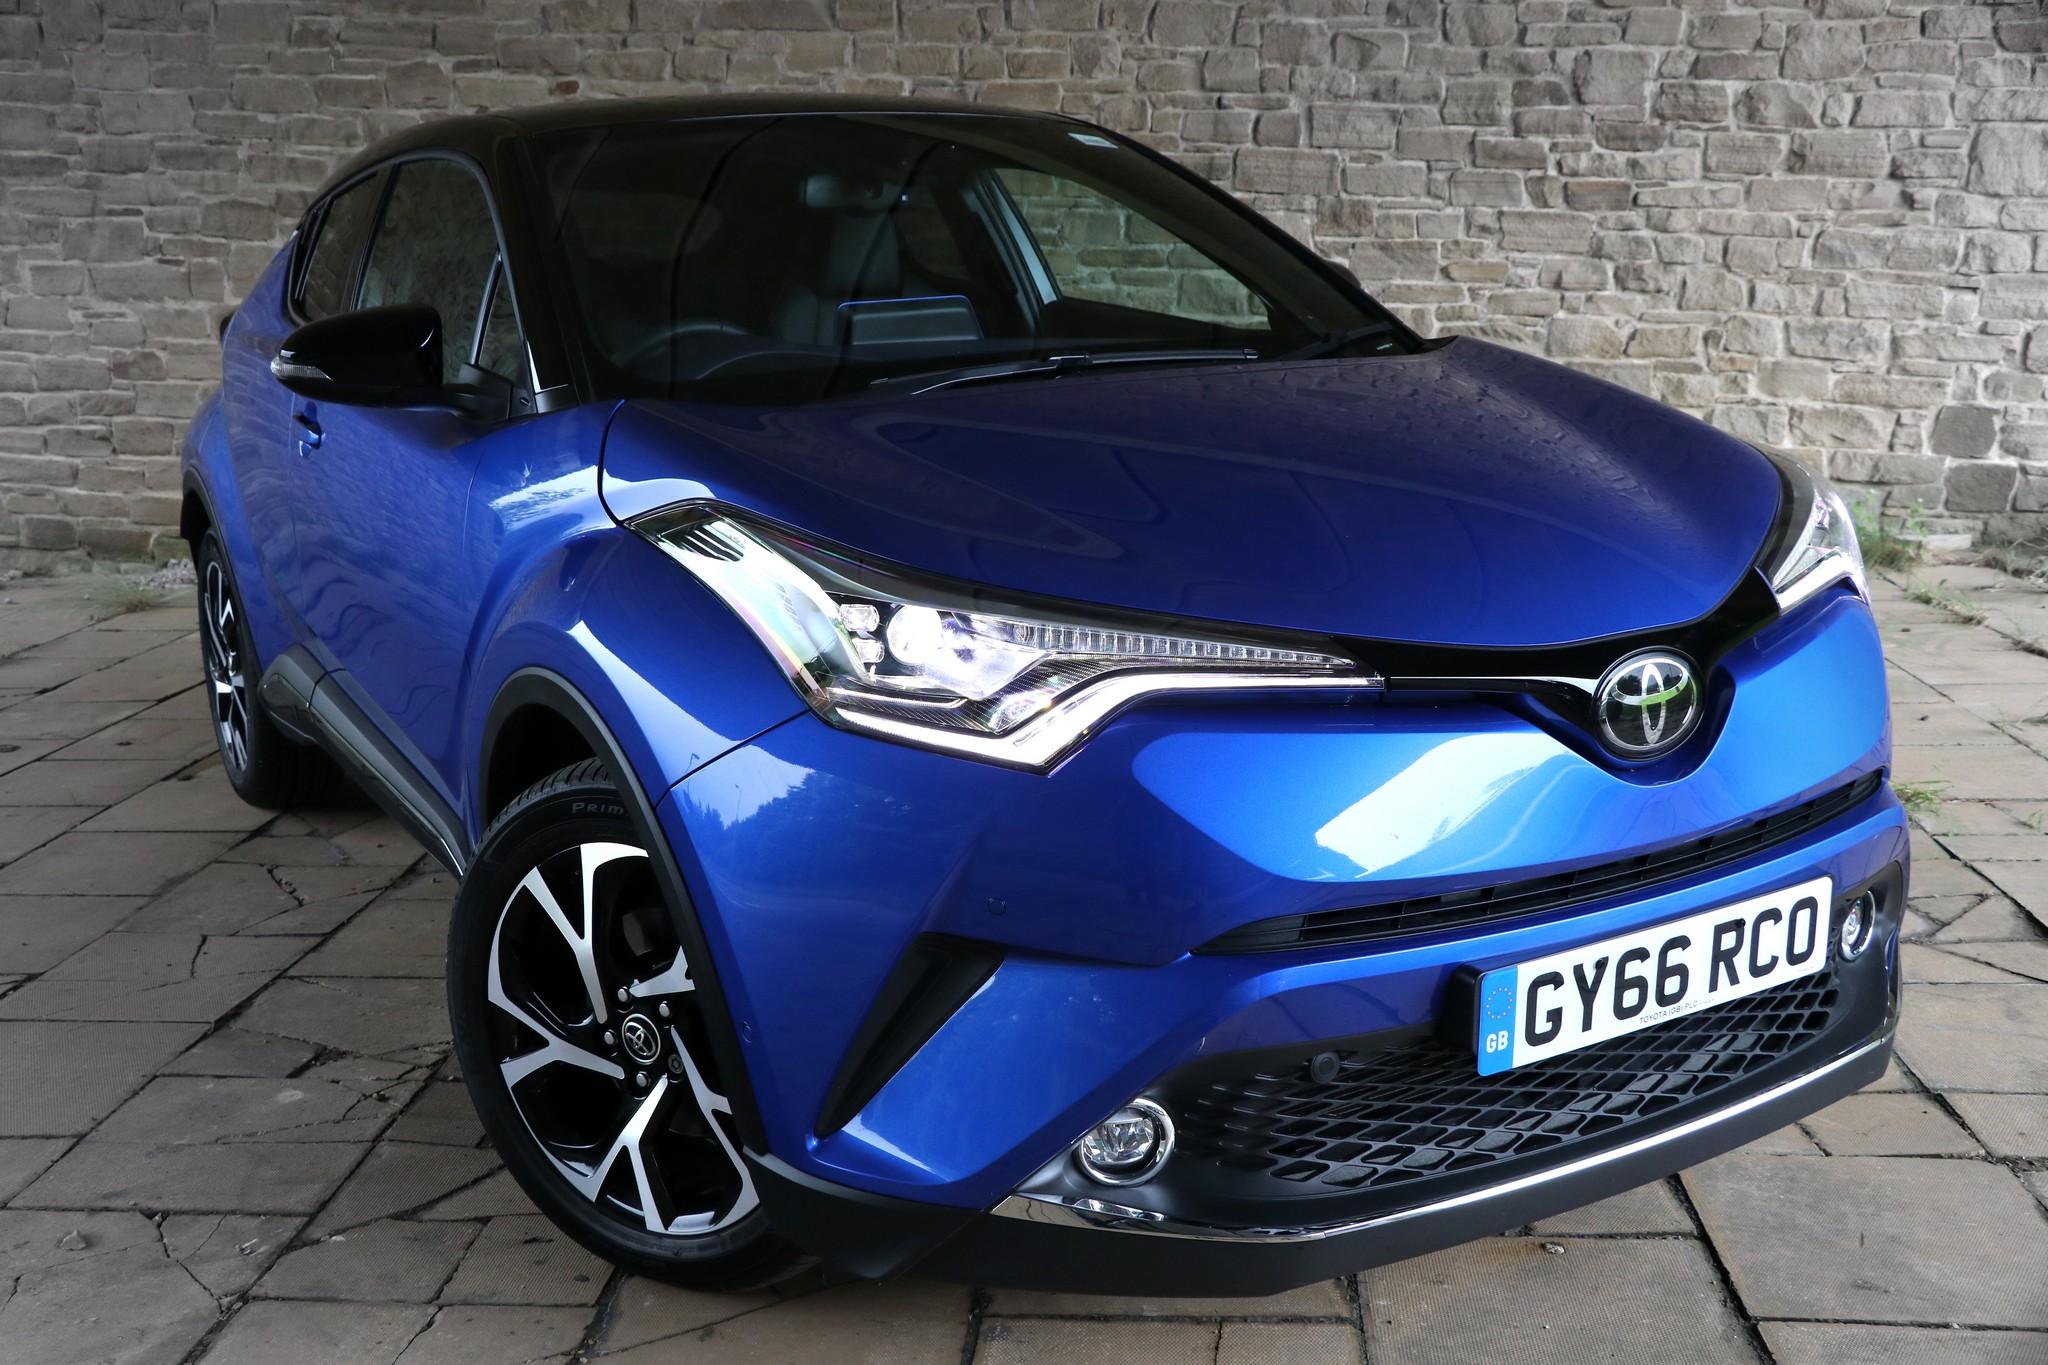 Toyota C-HR Dynamic 1.2 CVT - Review